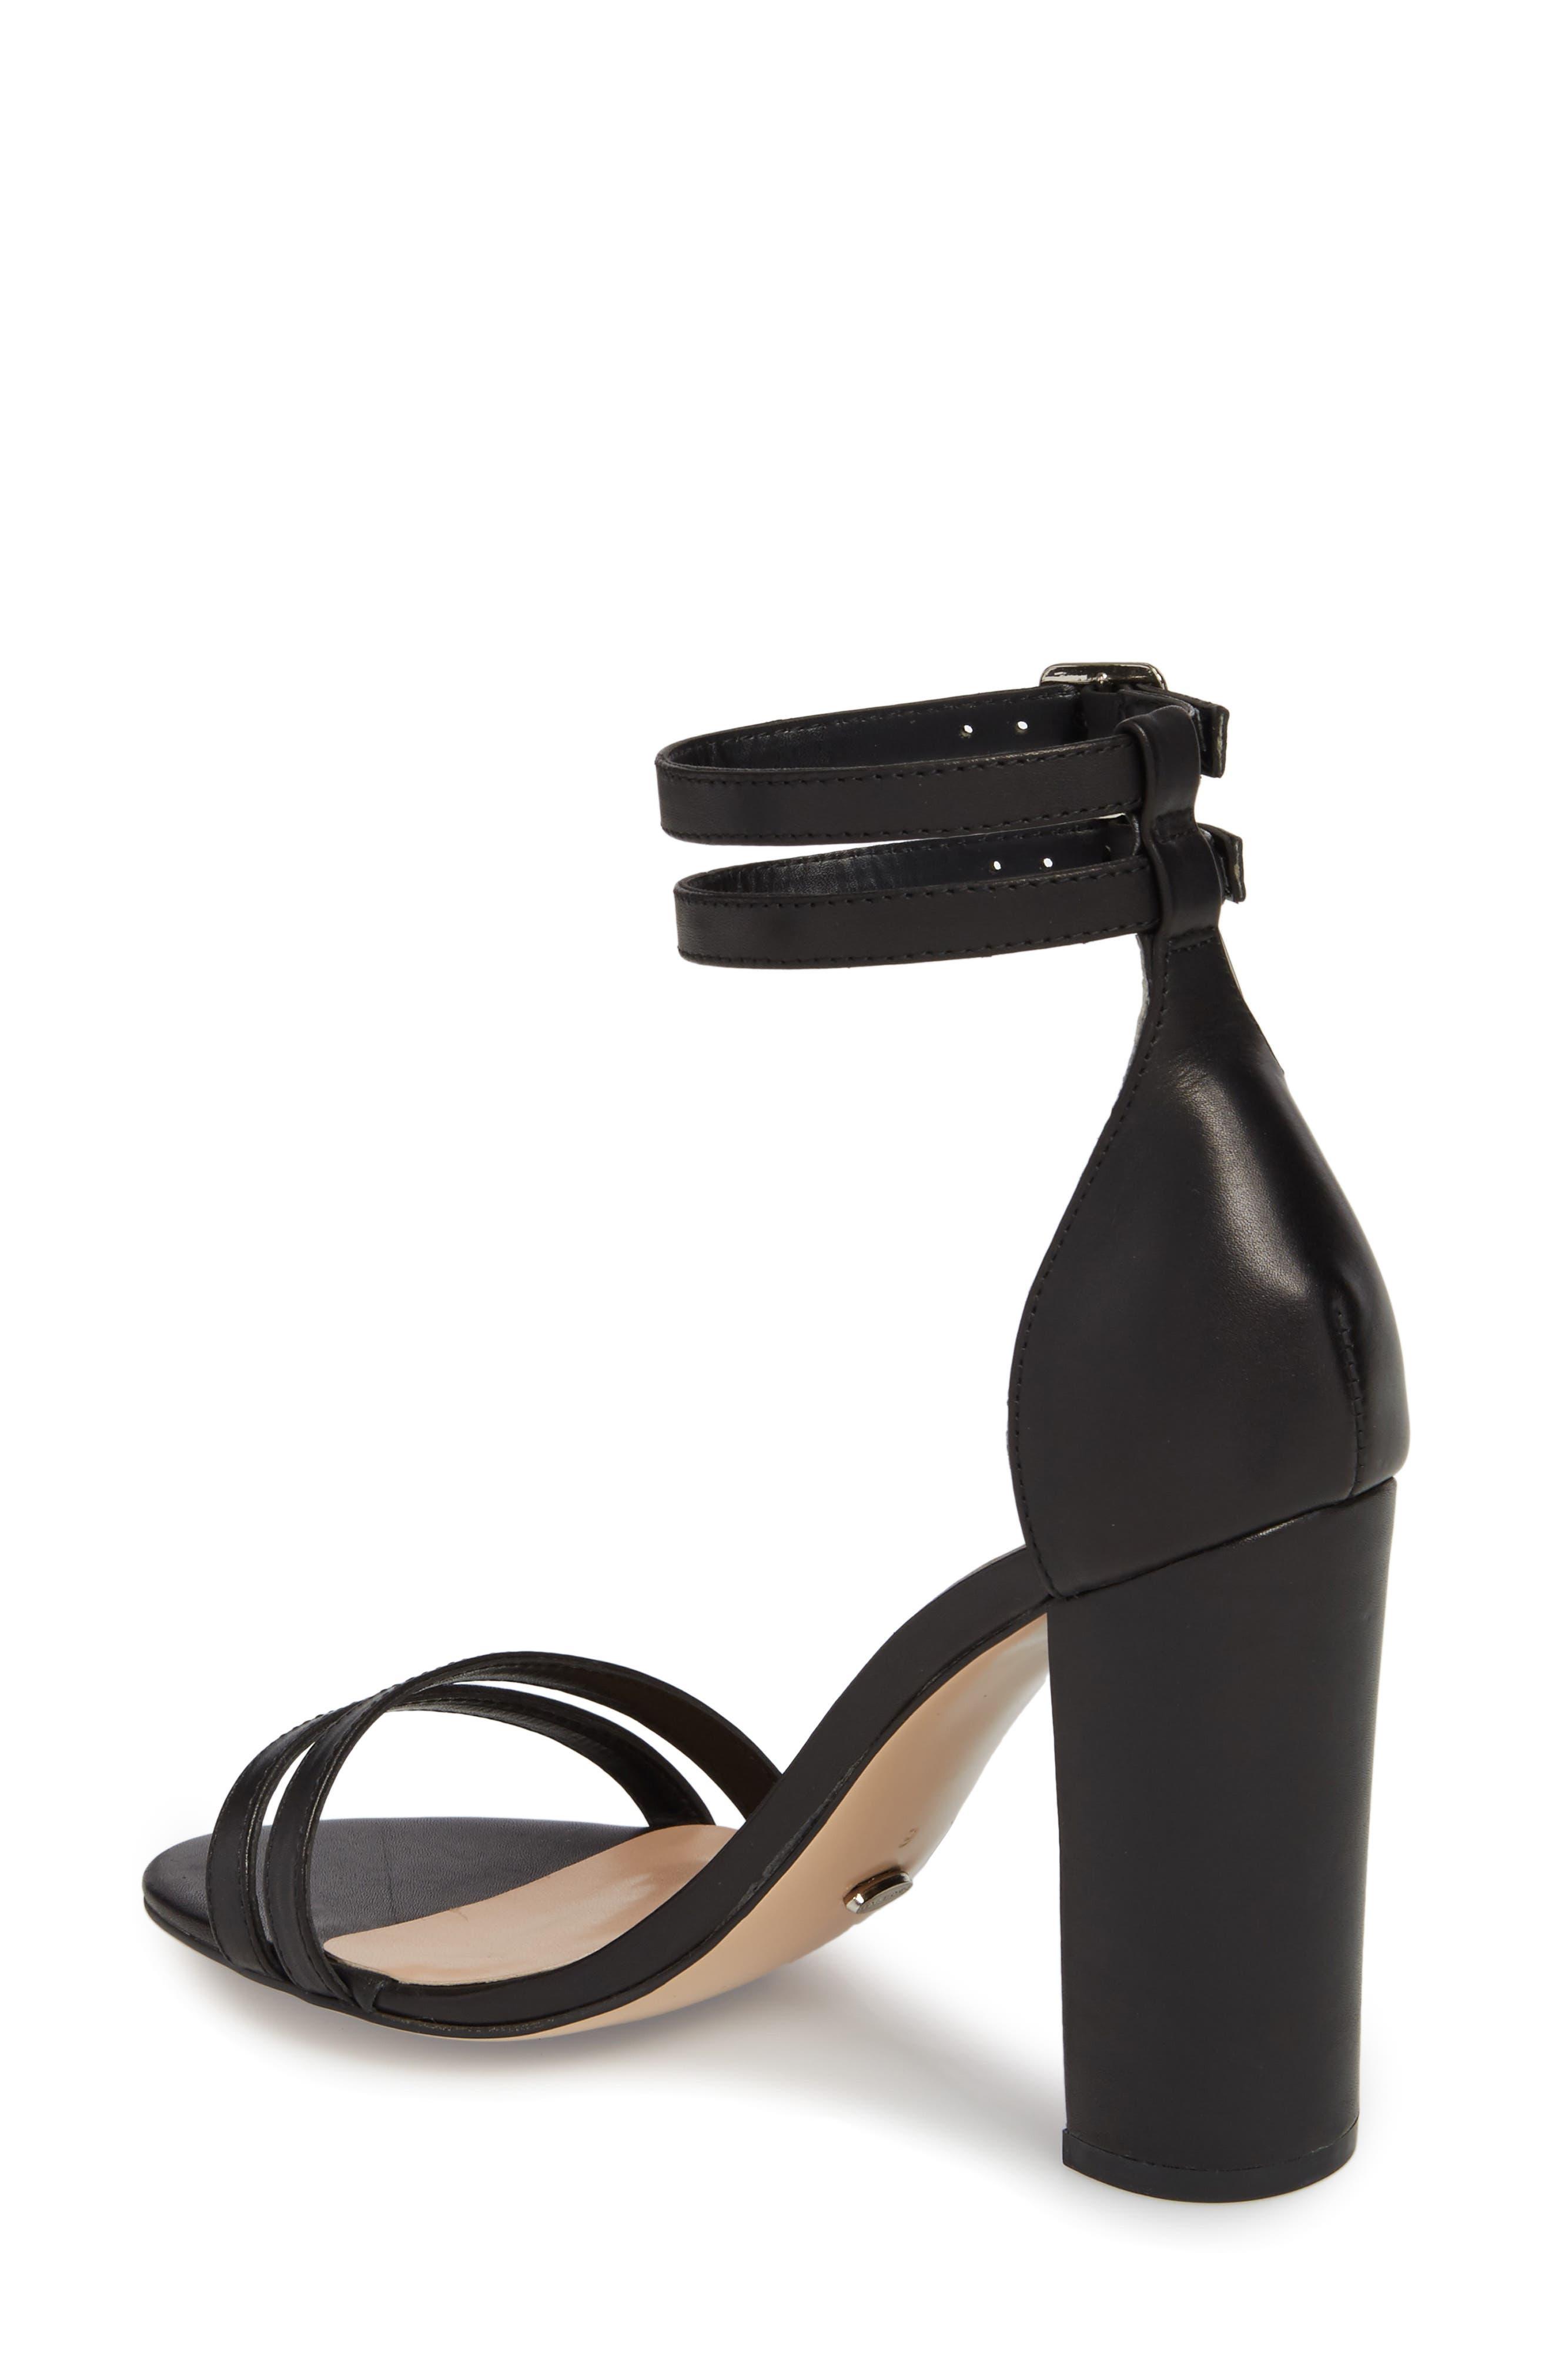 Kelly Block Heel Sandal,                             Alternate thumbnail 2, color,                             Black Monaco Leather